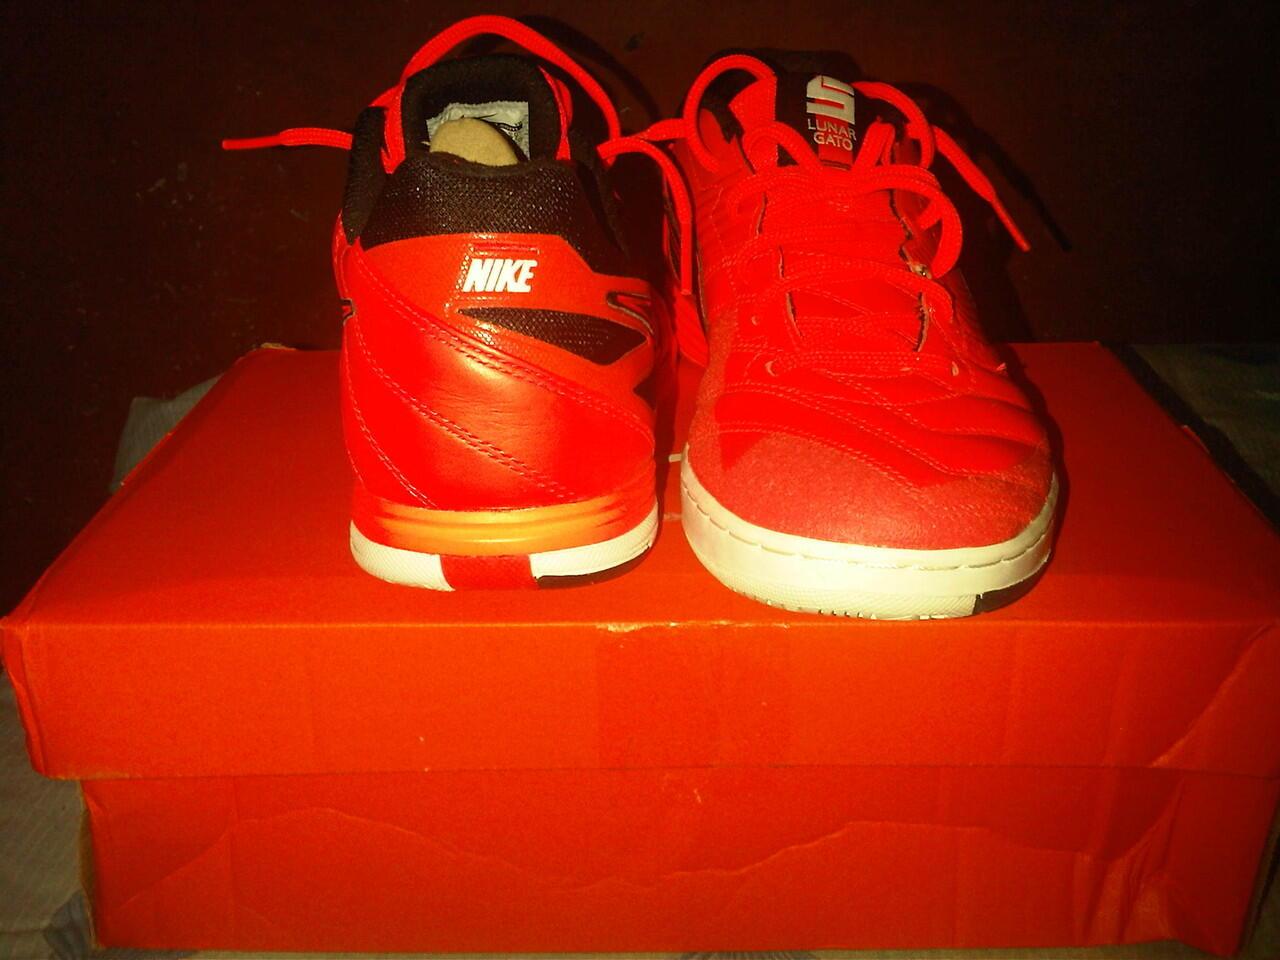 Nike5 Lunar Gato Crimson